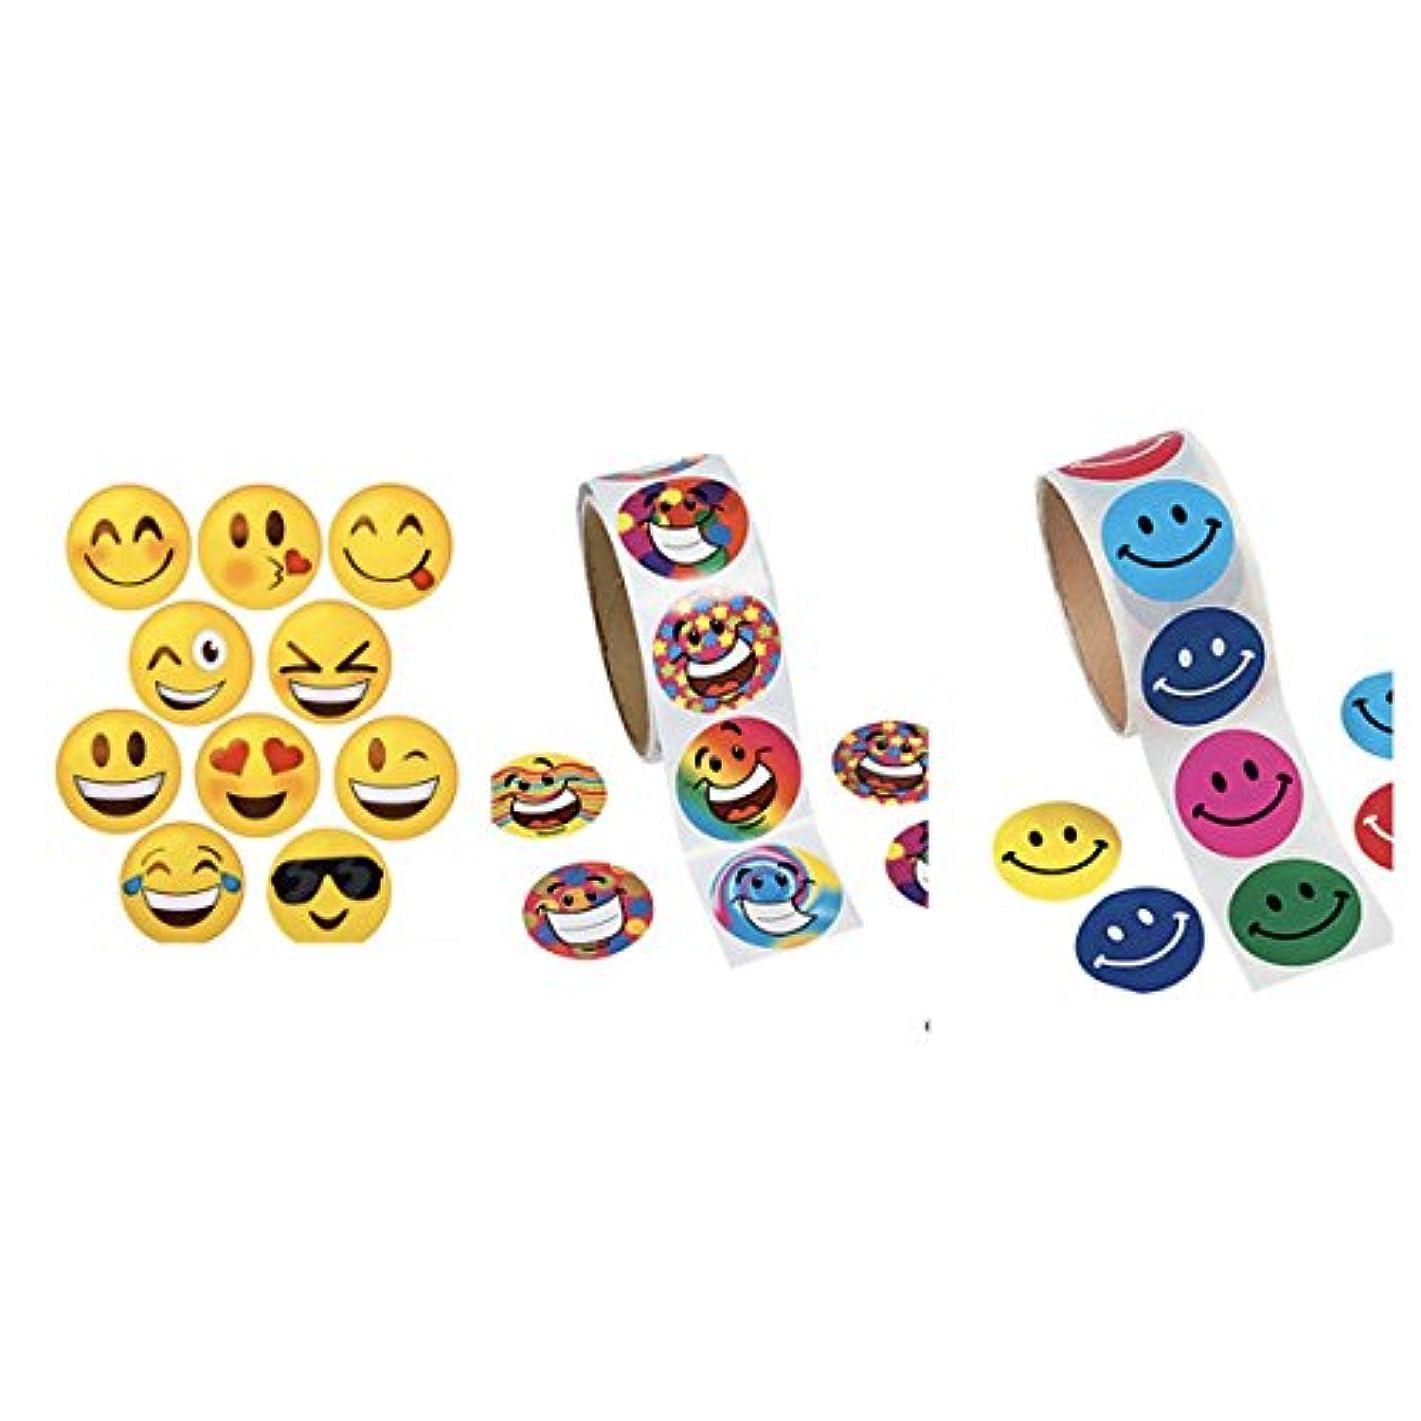 300 Assorted SMILEY FACE Stickers (3 Rolls of 100 Each) SCRAPBOOKING - ARTS & CRAFTS - CLASSROOM Teacher ACTIVITIES